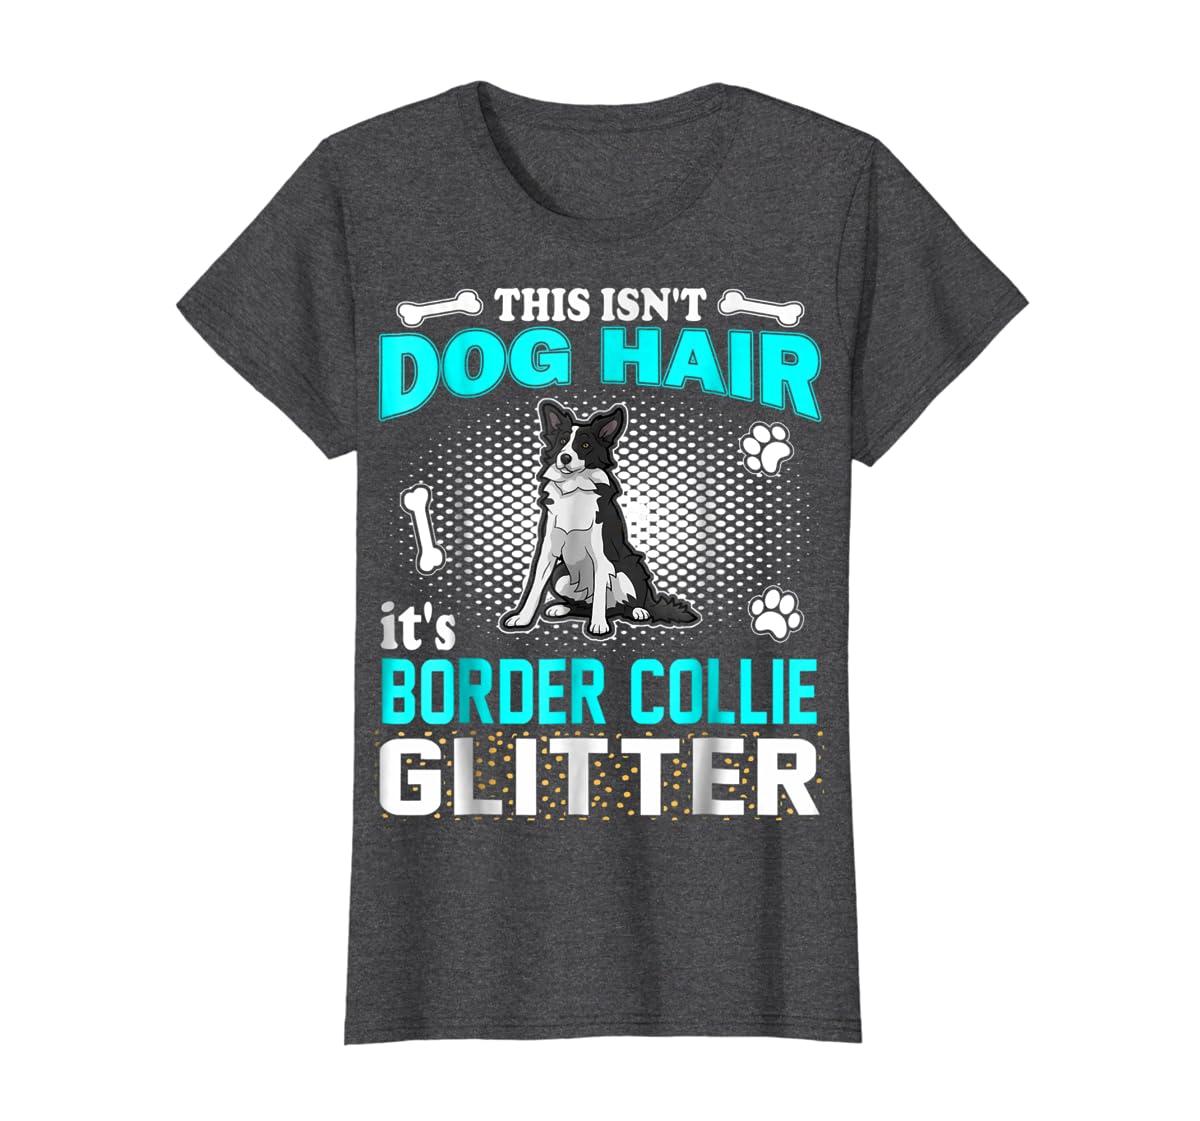 This Isn't Dog Hair It's Border Collie Glitter T-Shirt-Women's T-Shirt-Dark Heather